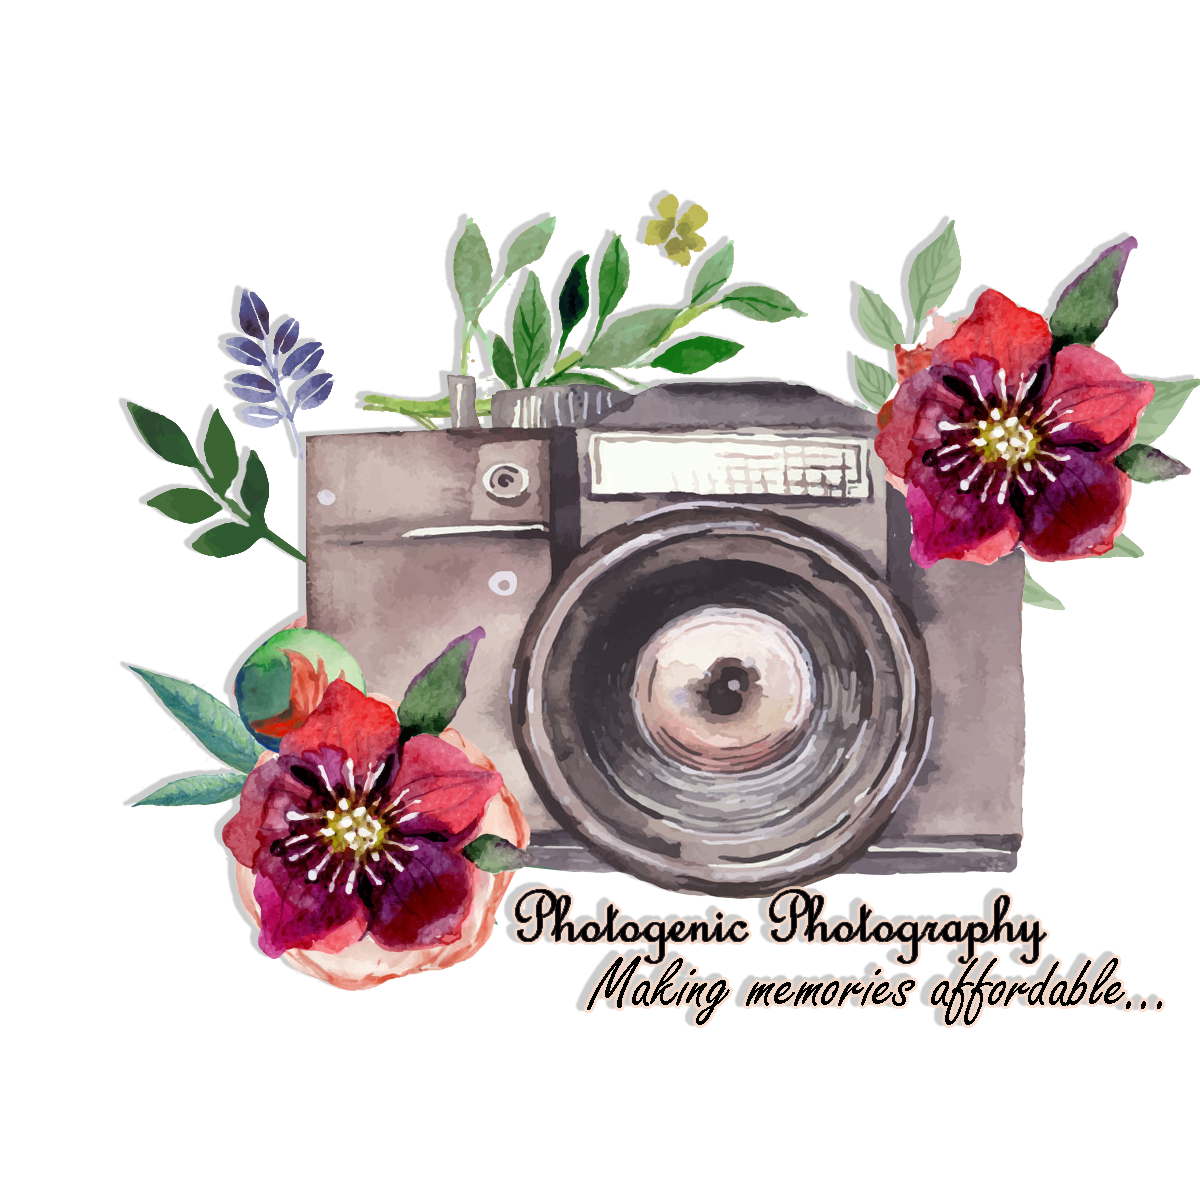 Photogenic Photography